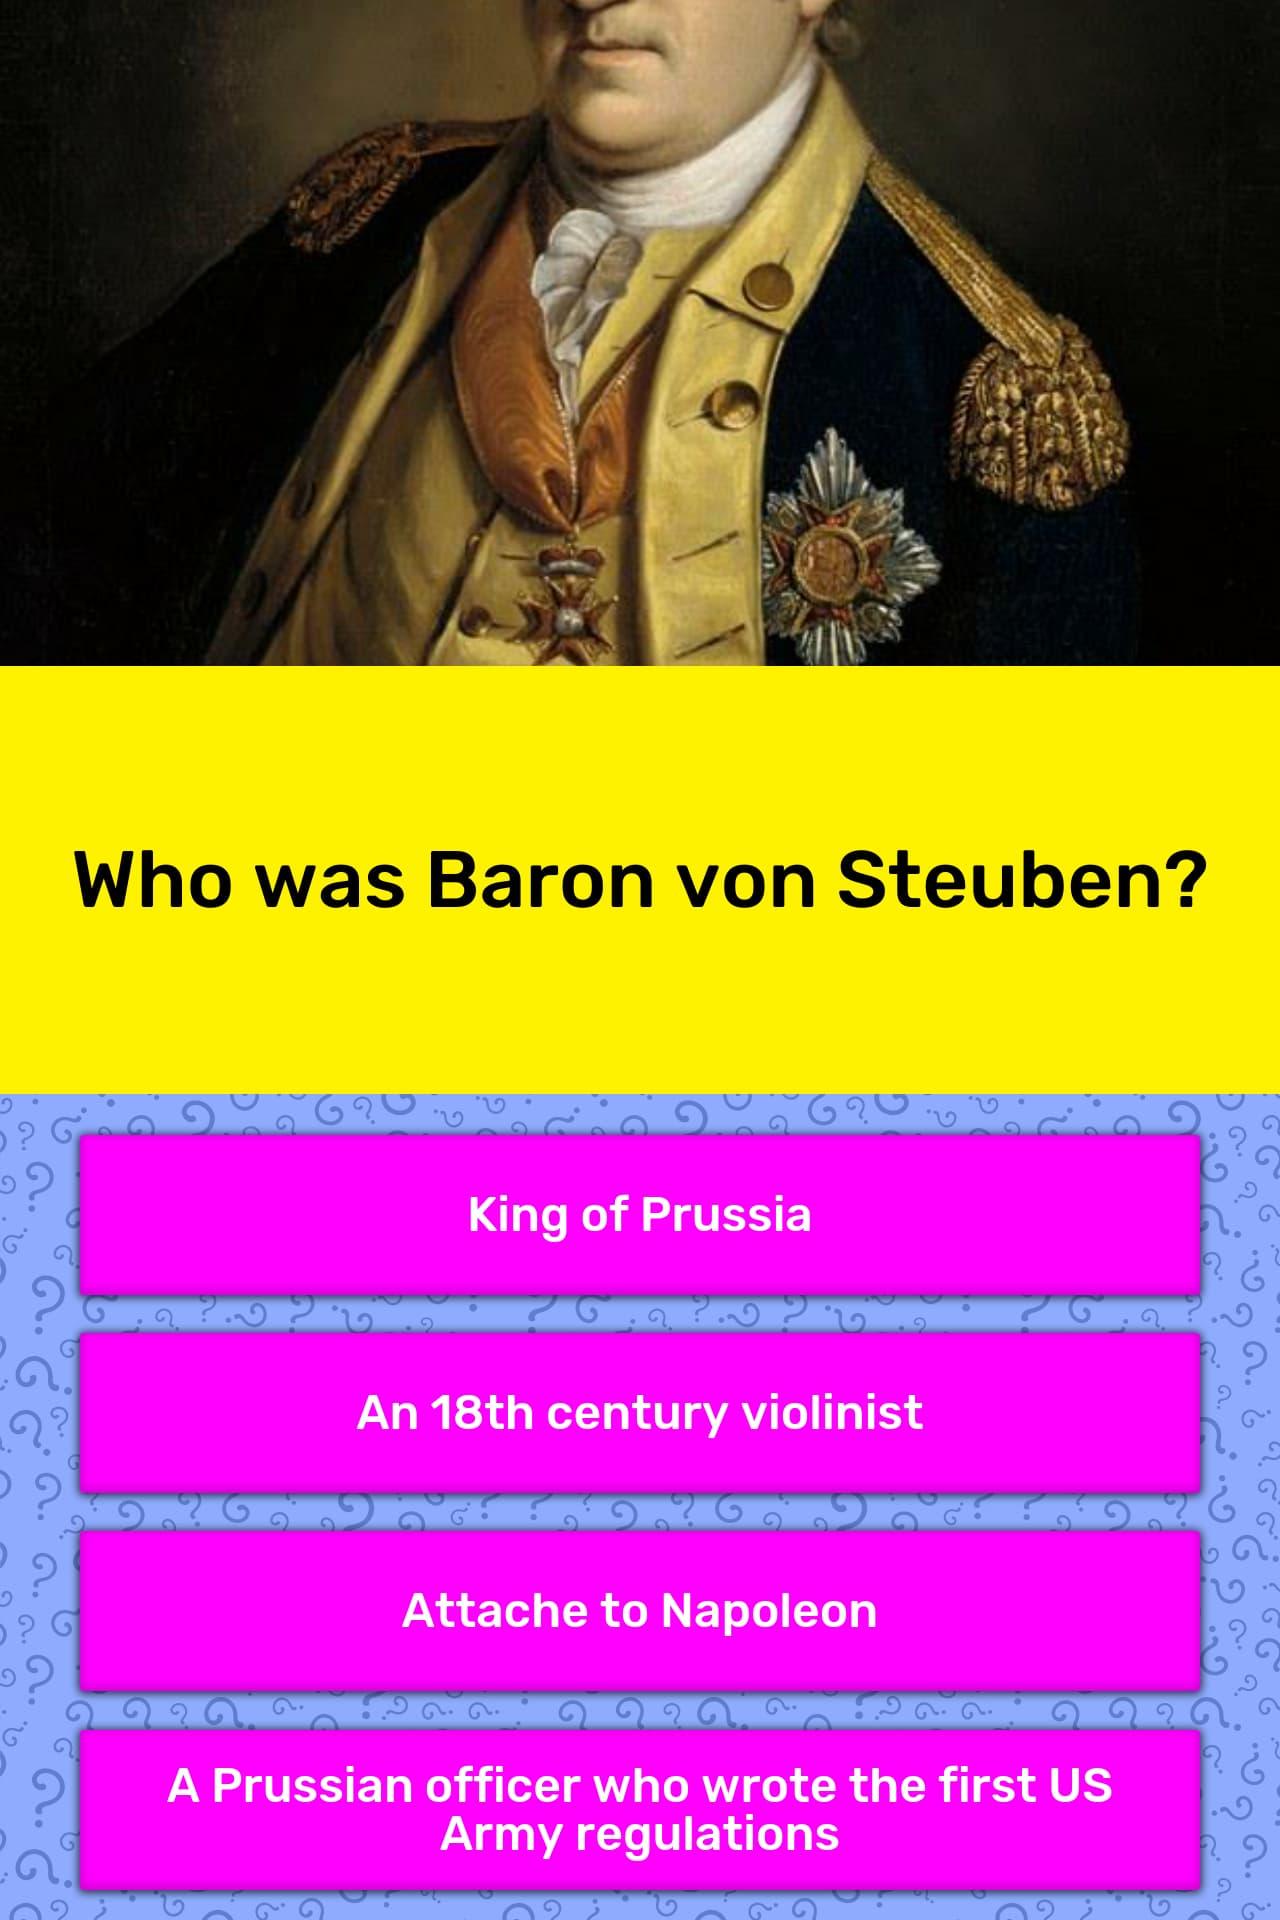 Who was Baron von Steuben? | Trivia Answers | QuizzClub